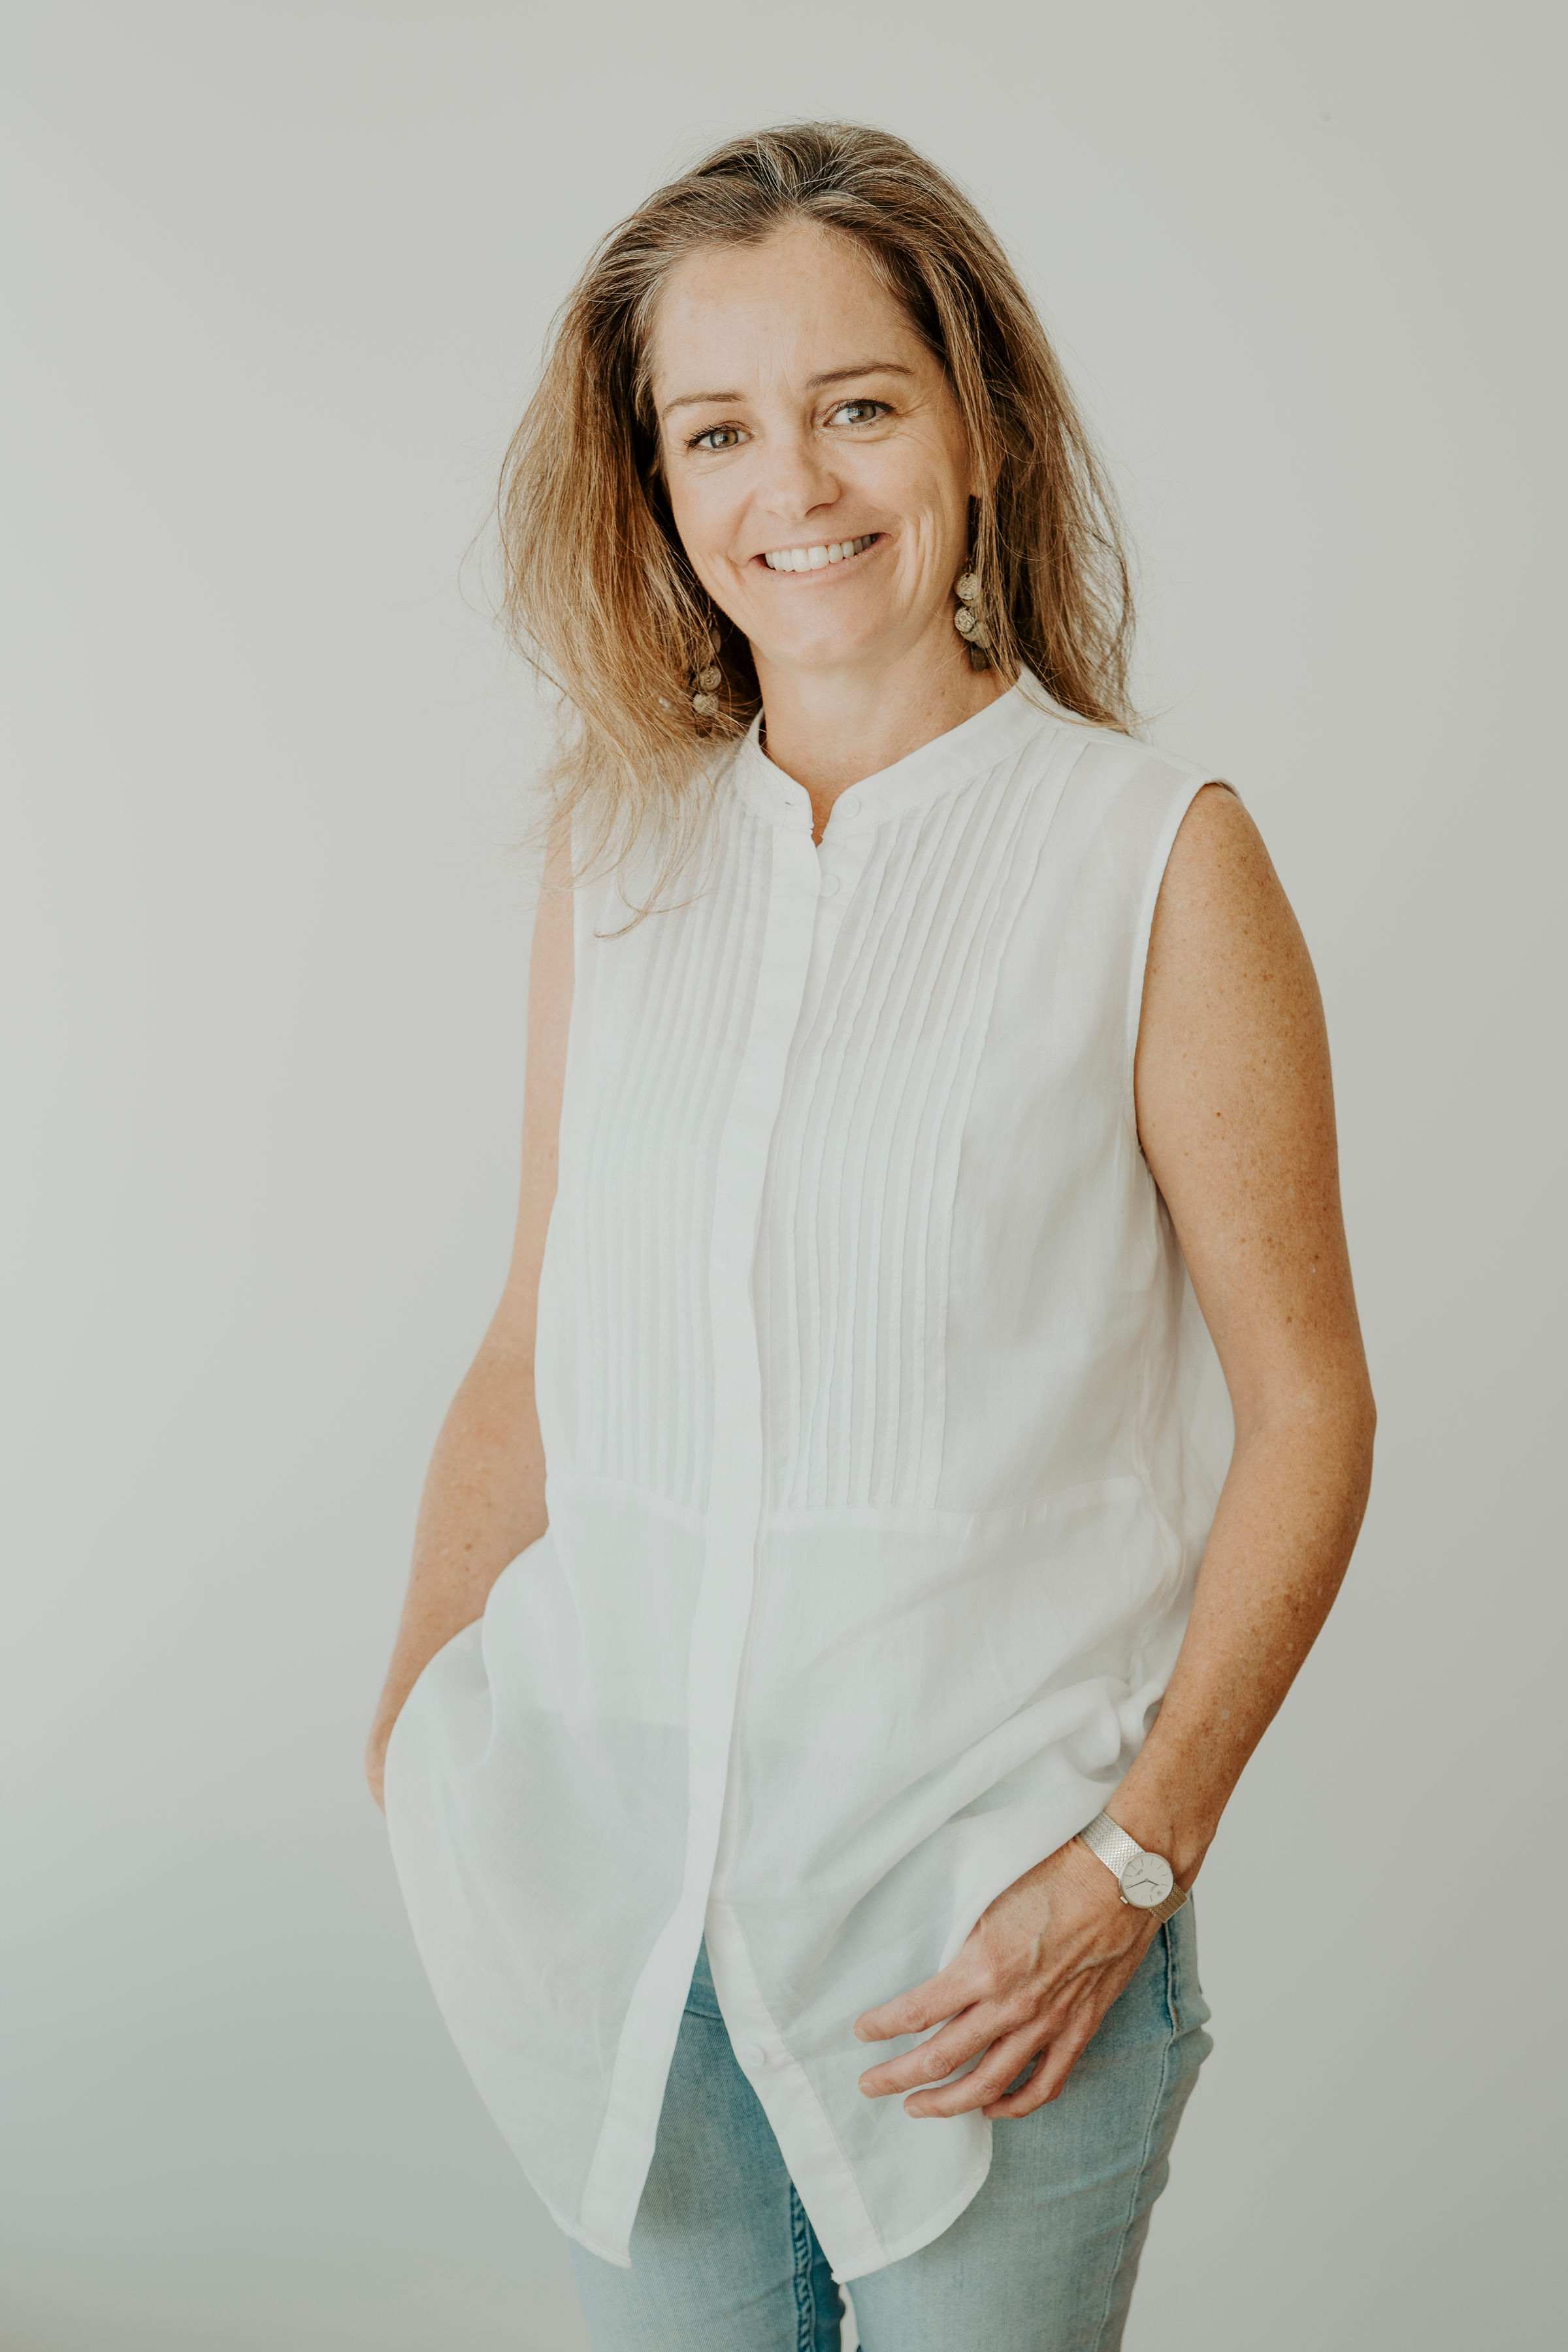 Rachael O'Byrne, Clinical Psychologist Fremantle